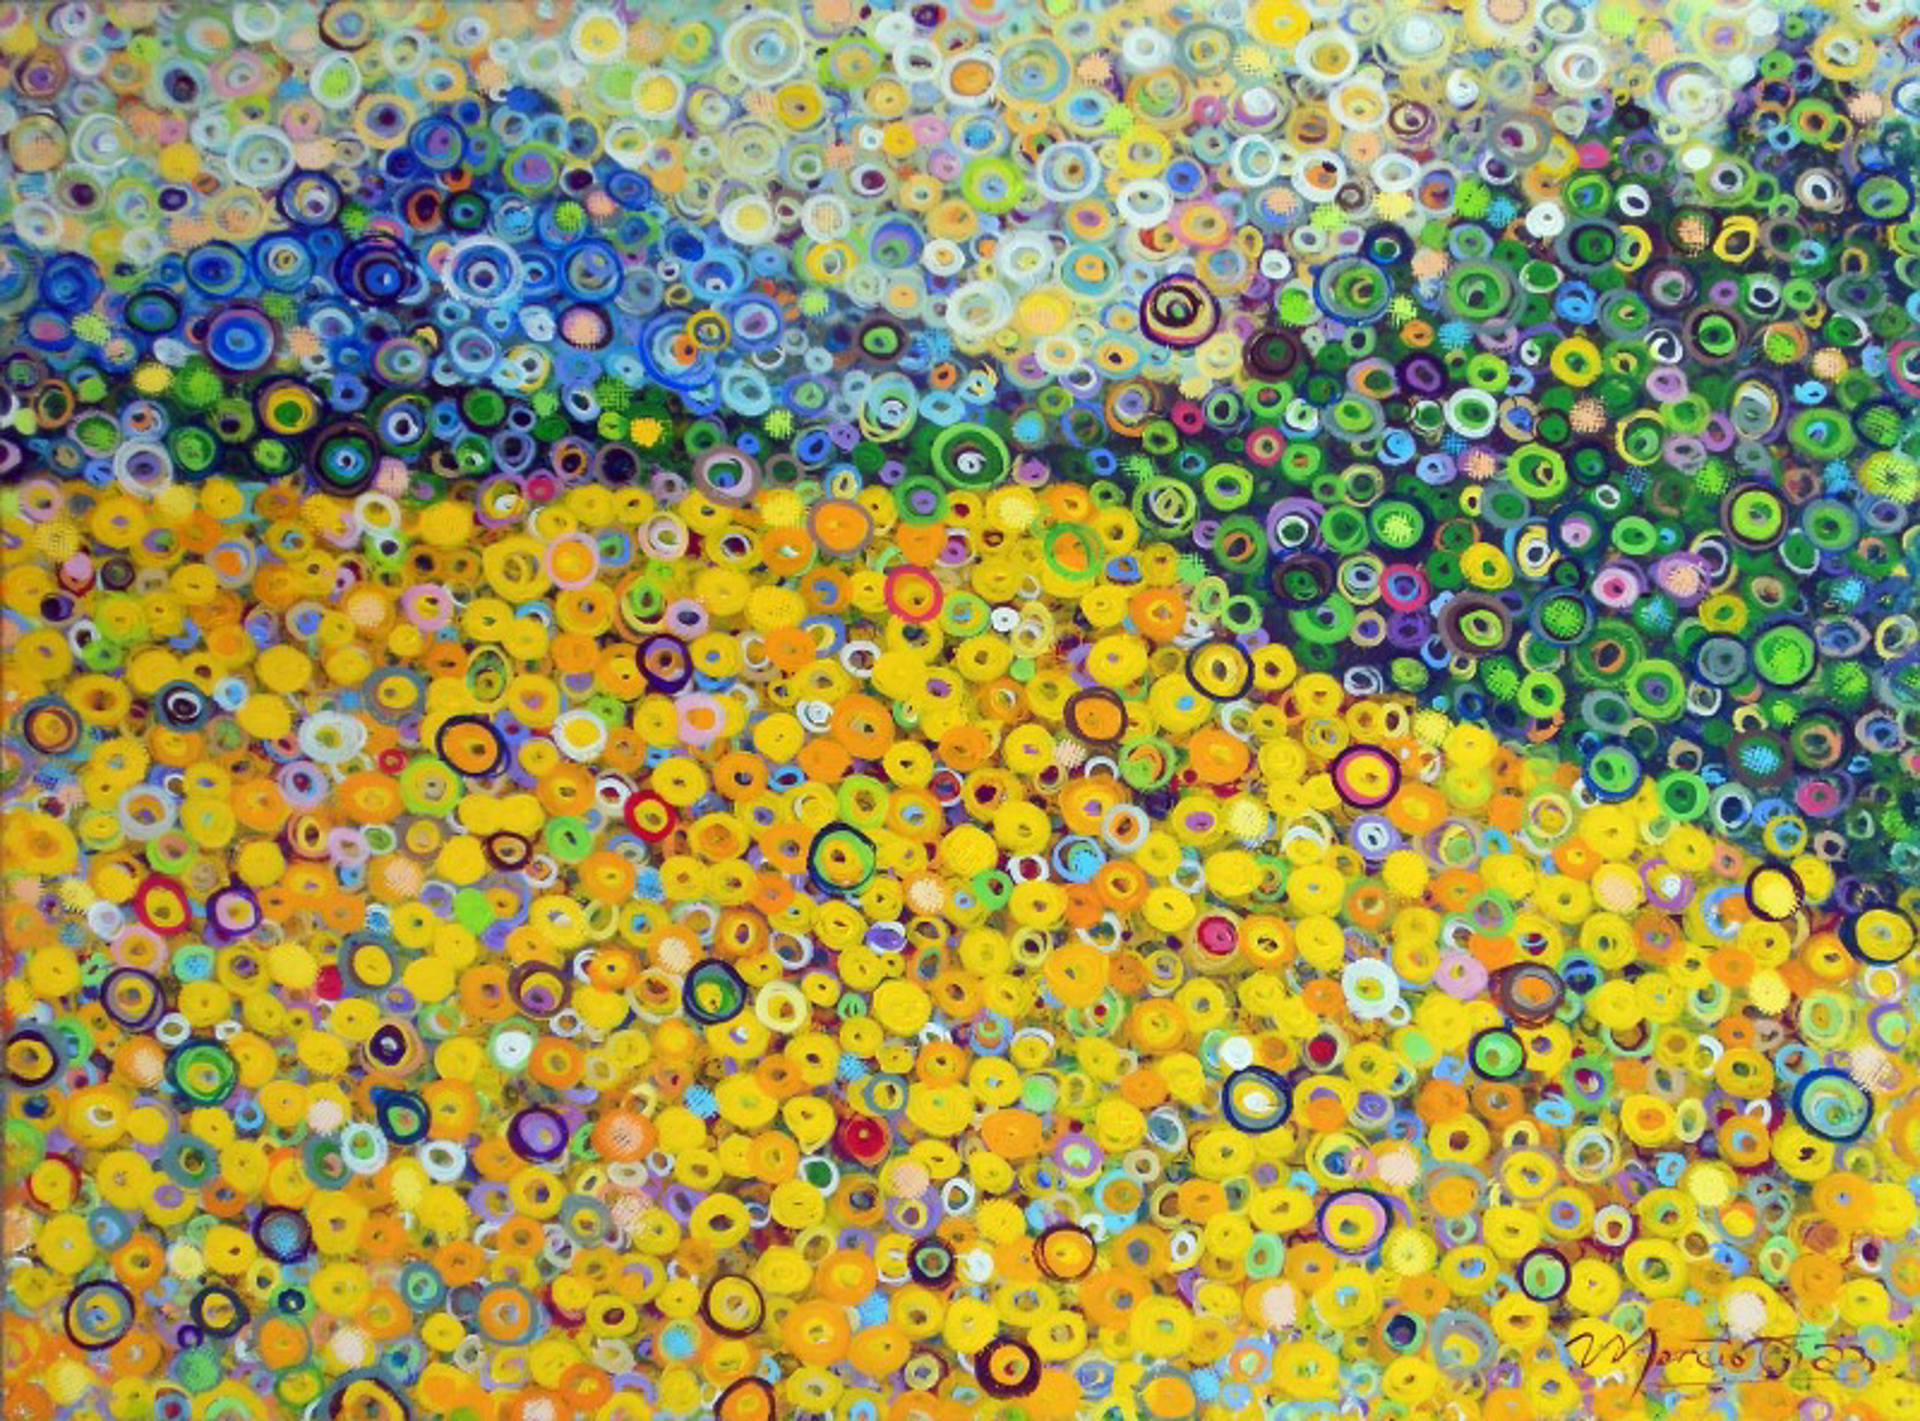 Spring Awakening by Marcio Diaz